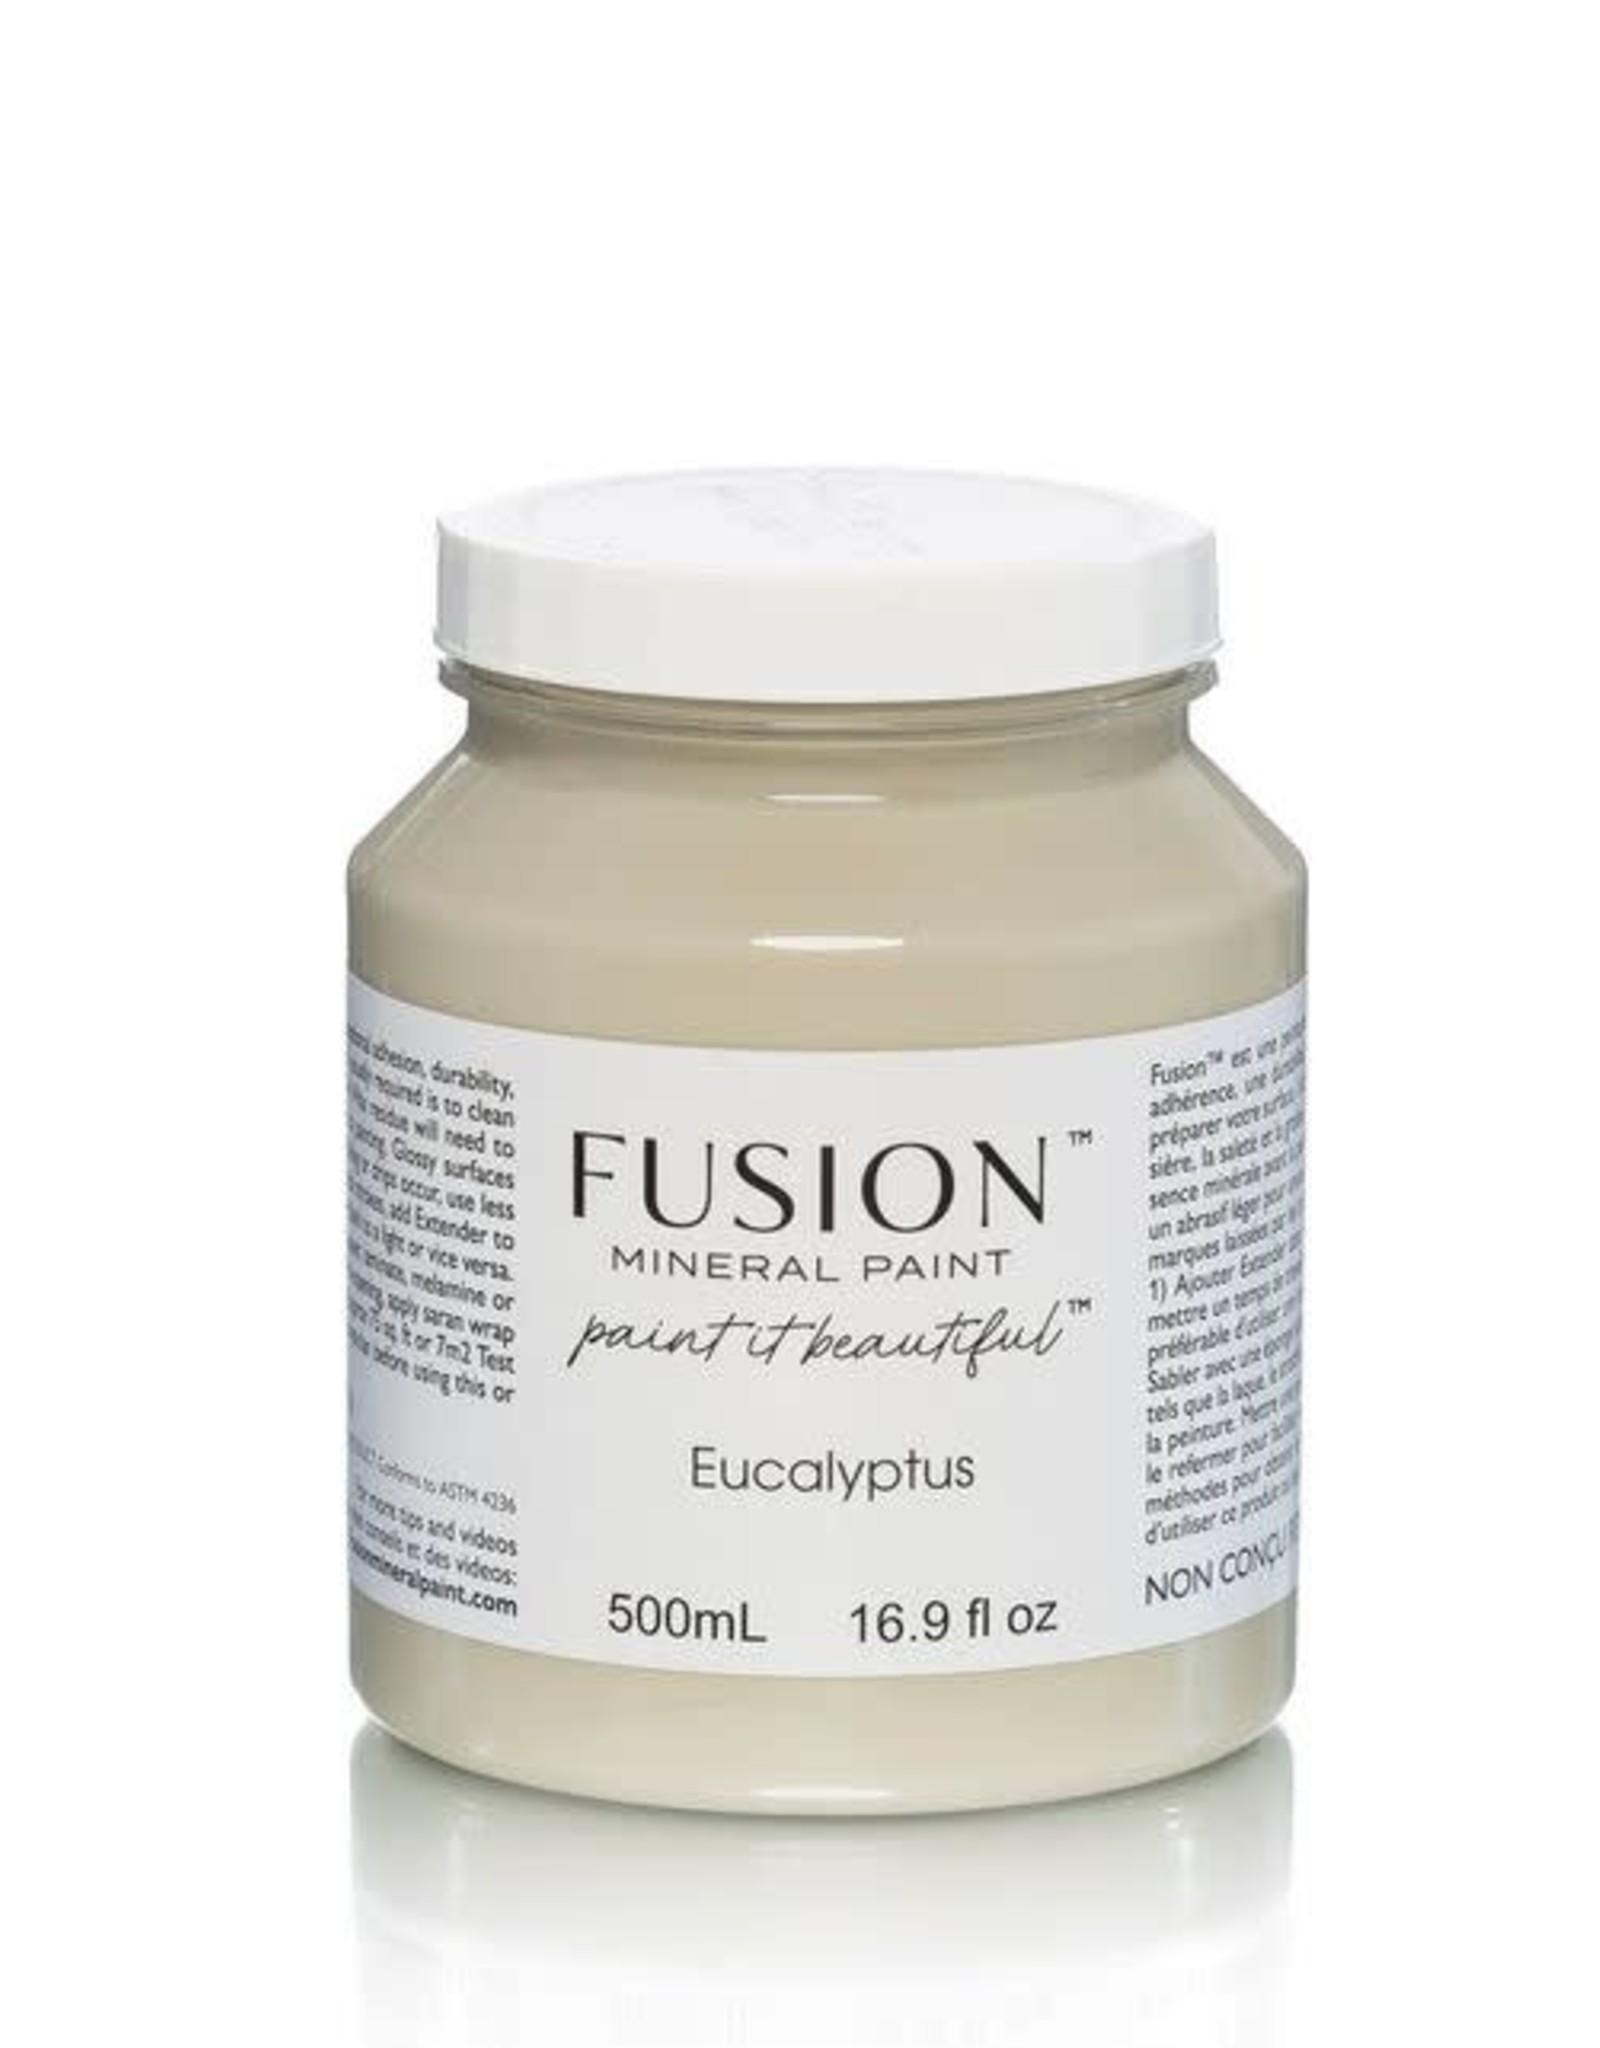 Fusion Mineral Paint Fusion Mineral Paint - Eucalyptus 500ml